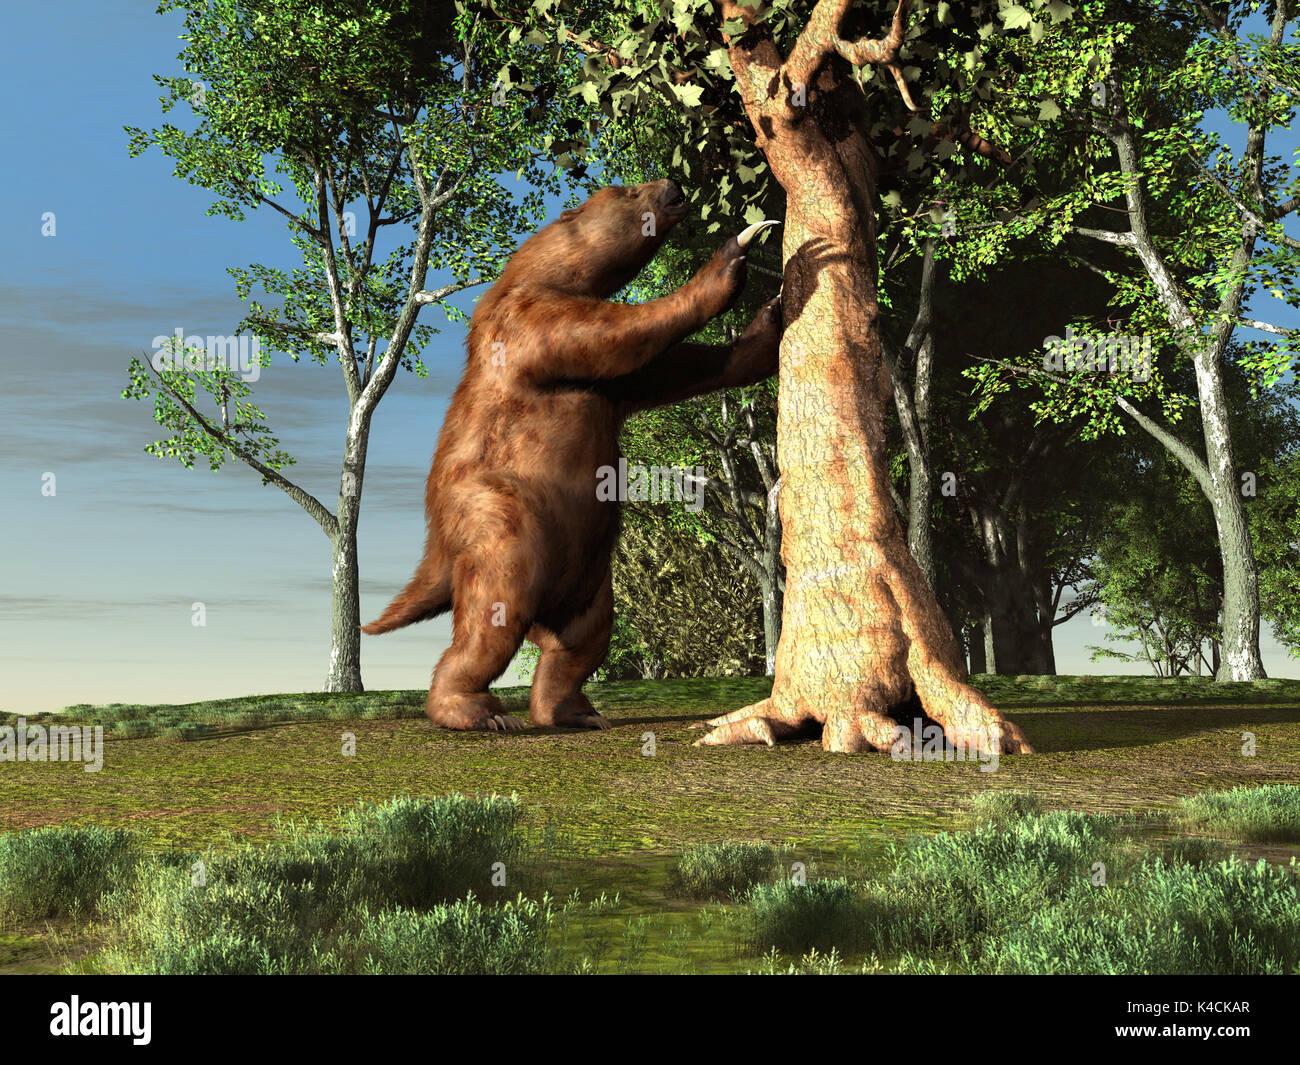 Giant sloth - Stock Image